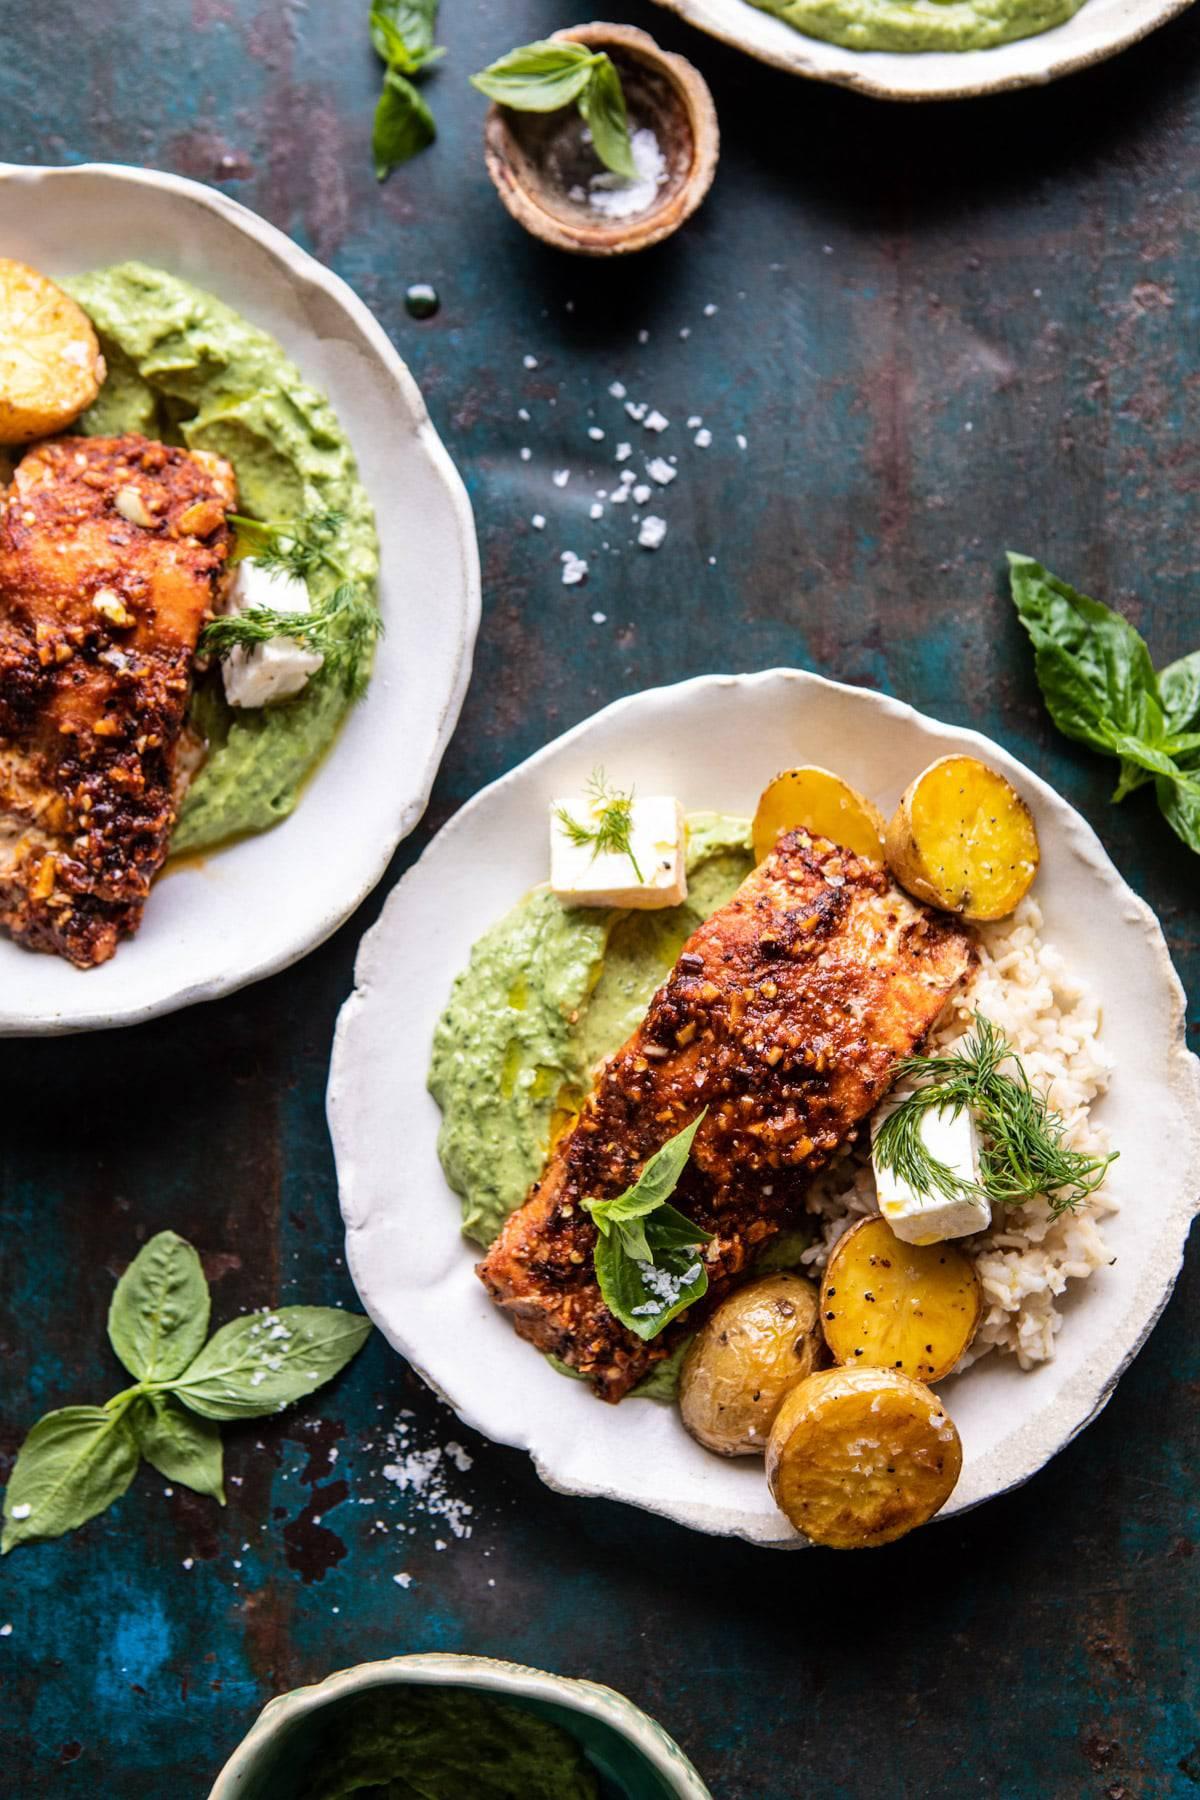 Sheet Pan Blackened Salmon Bowl with Potatoes and Avocado Goddess Sauce | halfbakedharvest.com #shetpan #healthyrecipes #easyrecipes #bowlfood #salmon